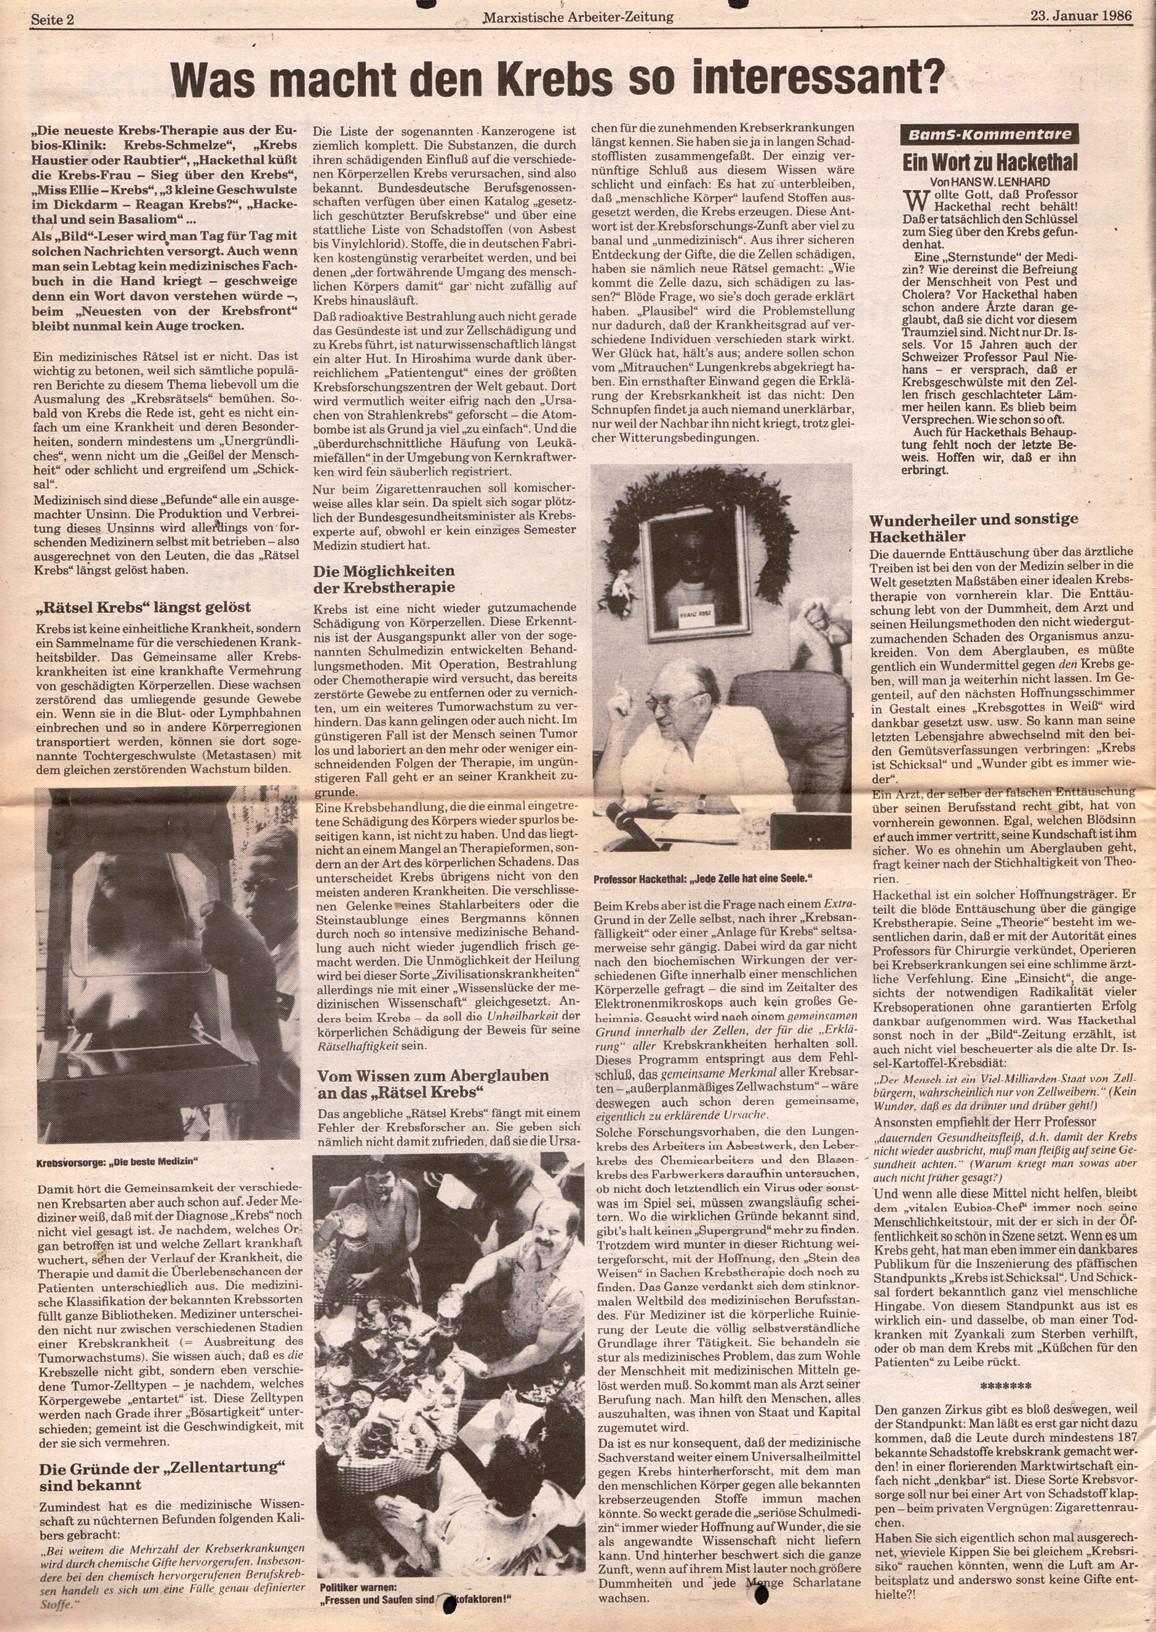 Muenchen_MG_MAZ_MAN_19860123_02